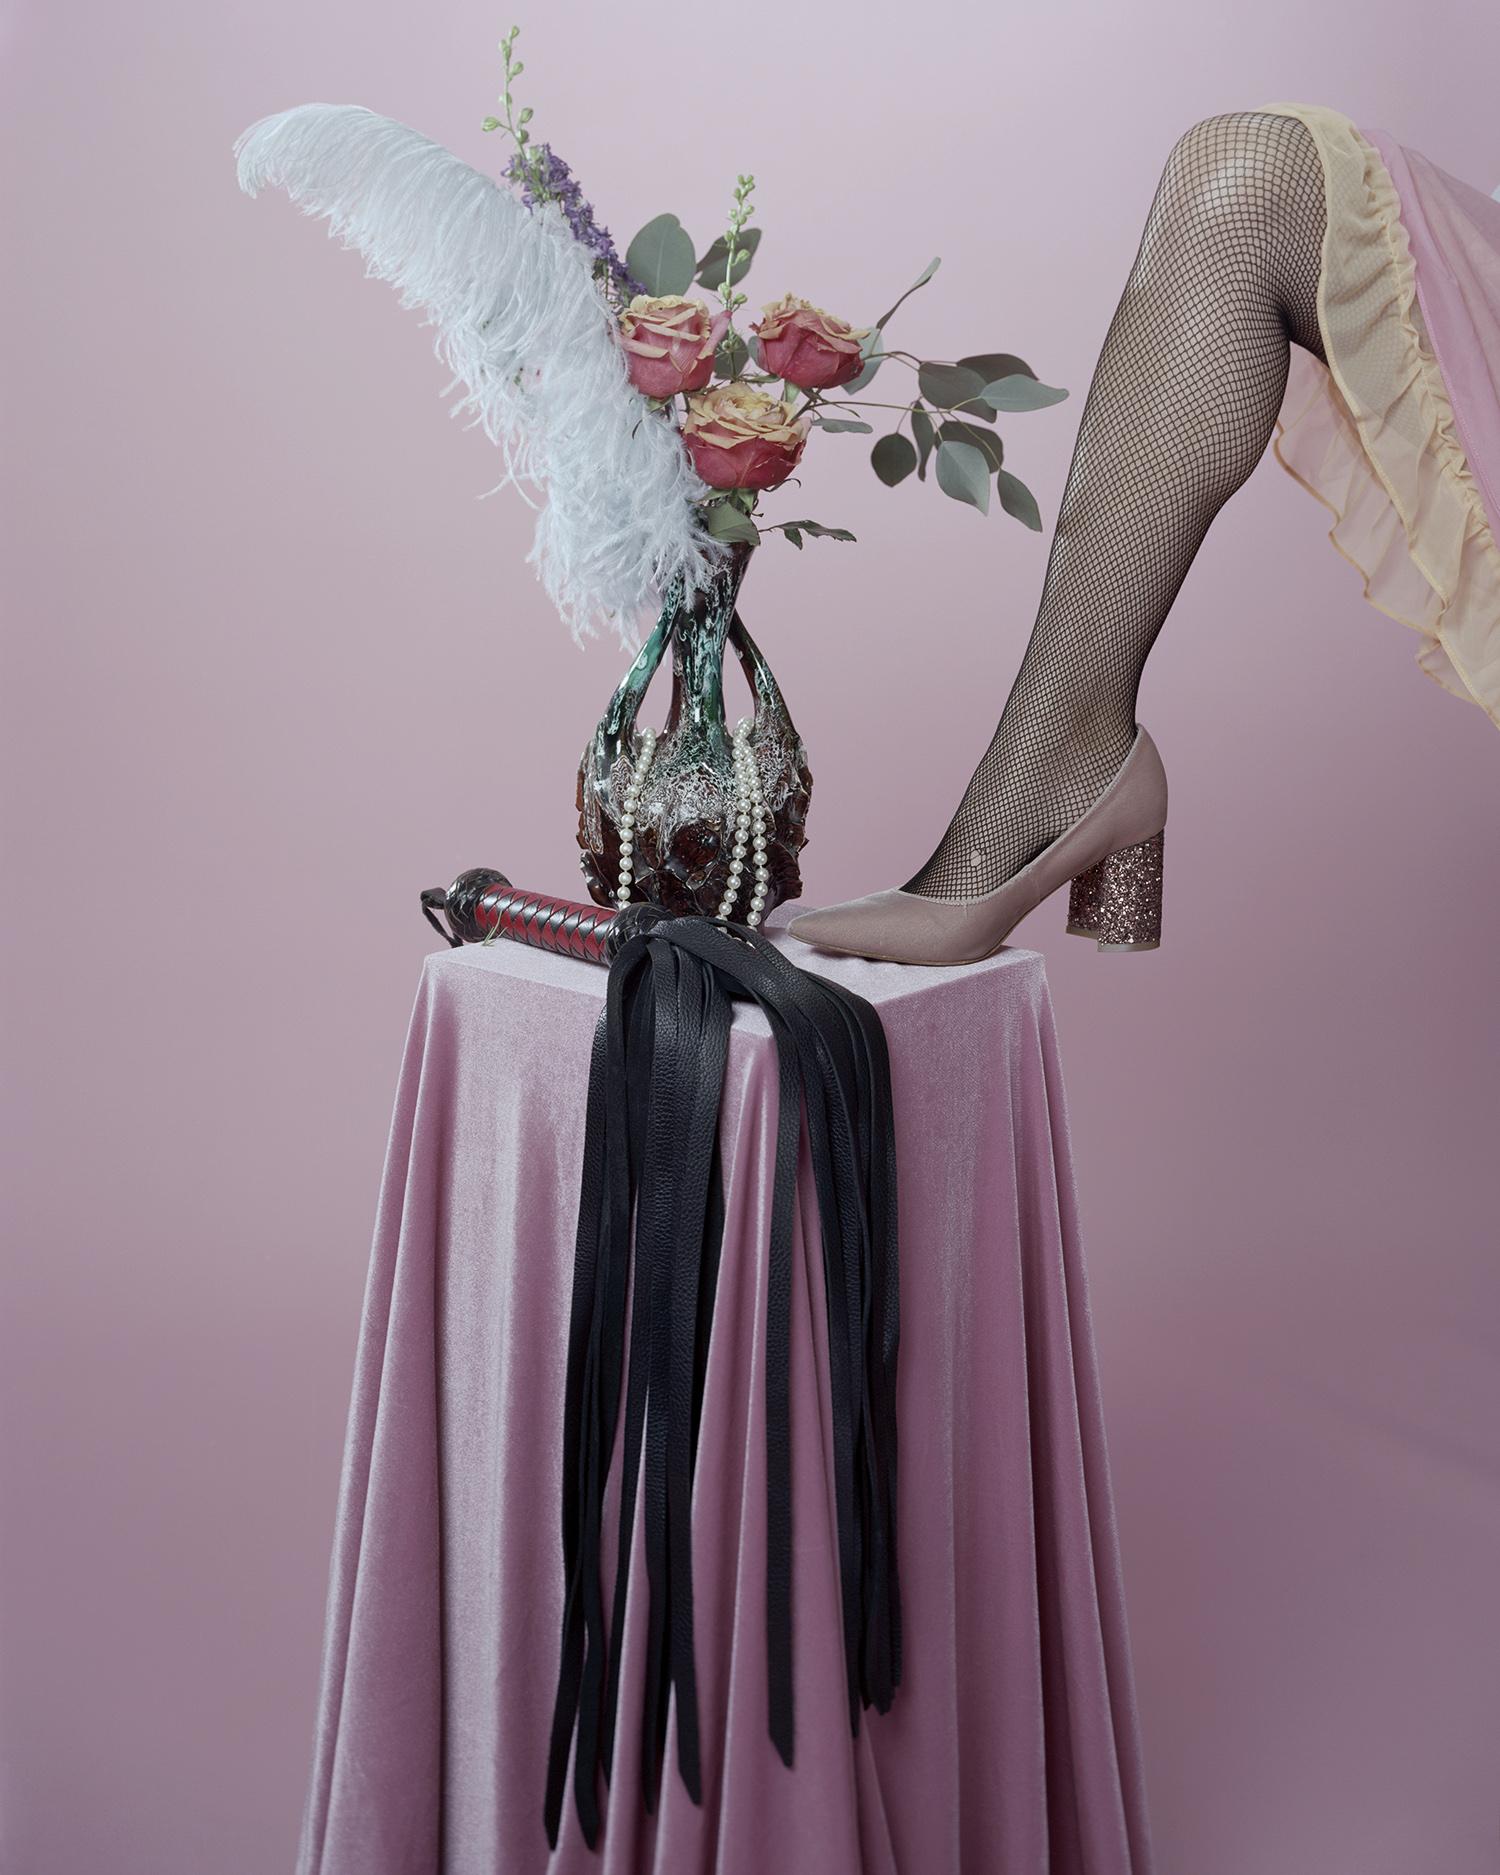 """Pink With Whip"" by Amanda Rowan"